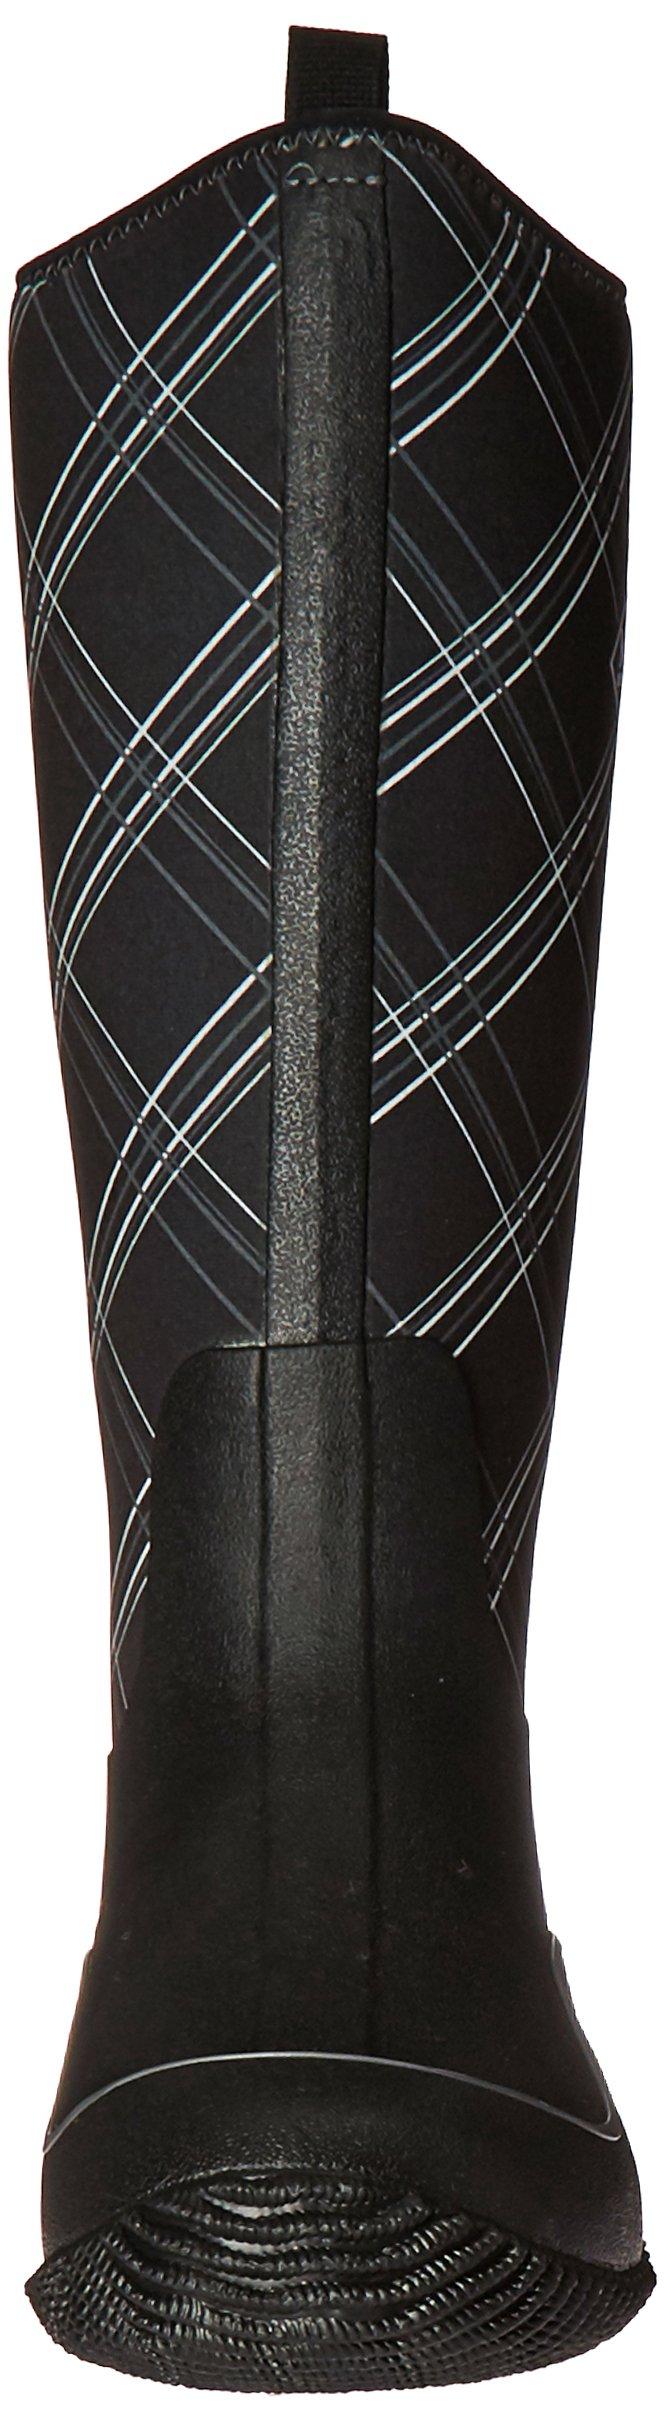 Muck Hale Multi-Season Women's Rubber Boots by Muck Boot (Image #4)